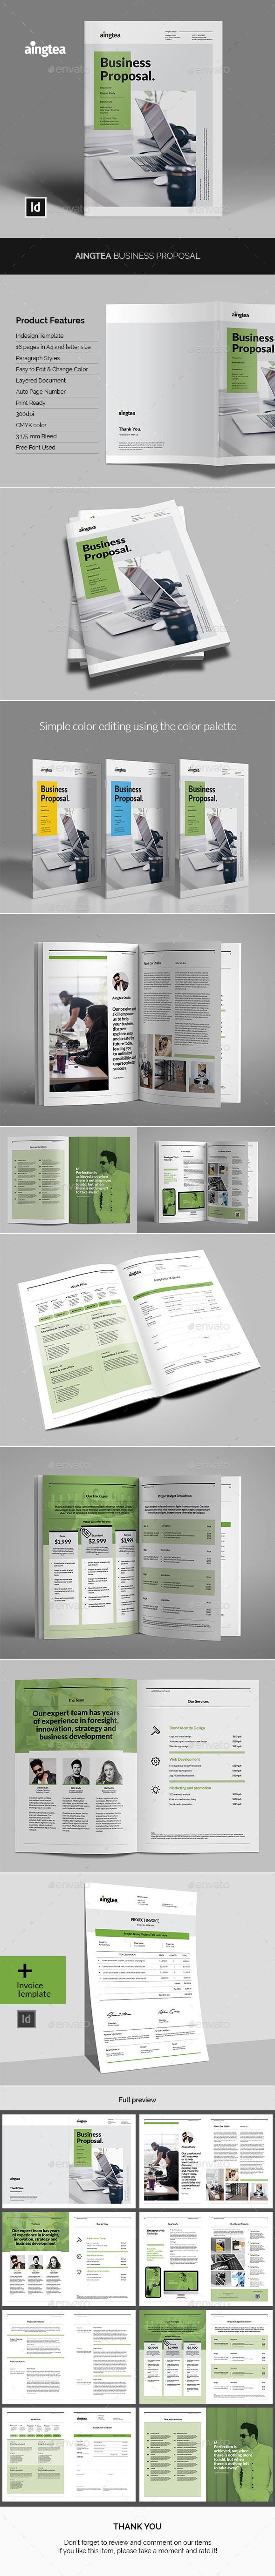 Aingtea Business Proposal - Proposals & Invoices Stationery